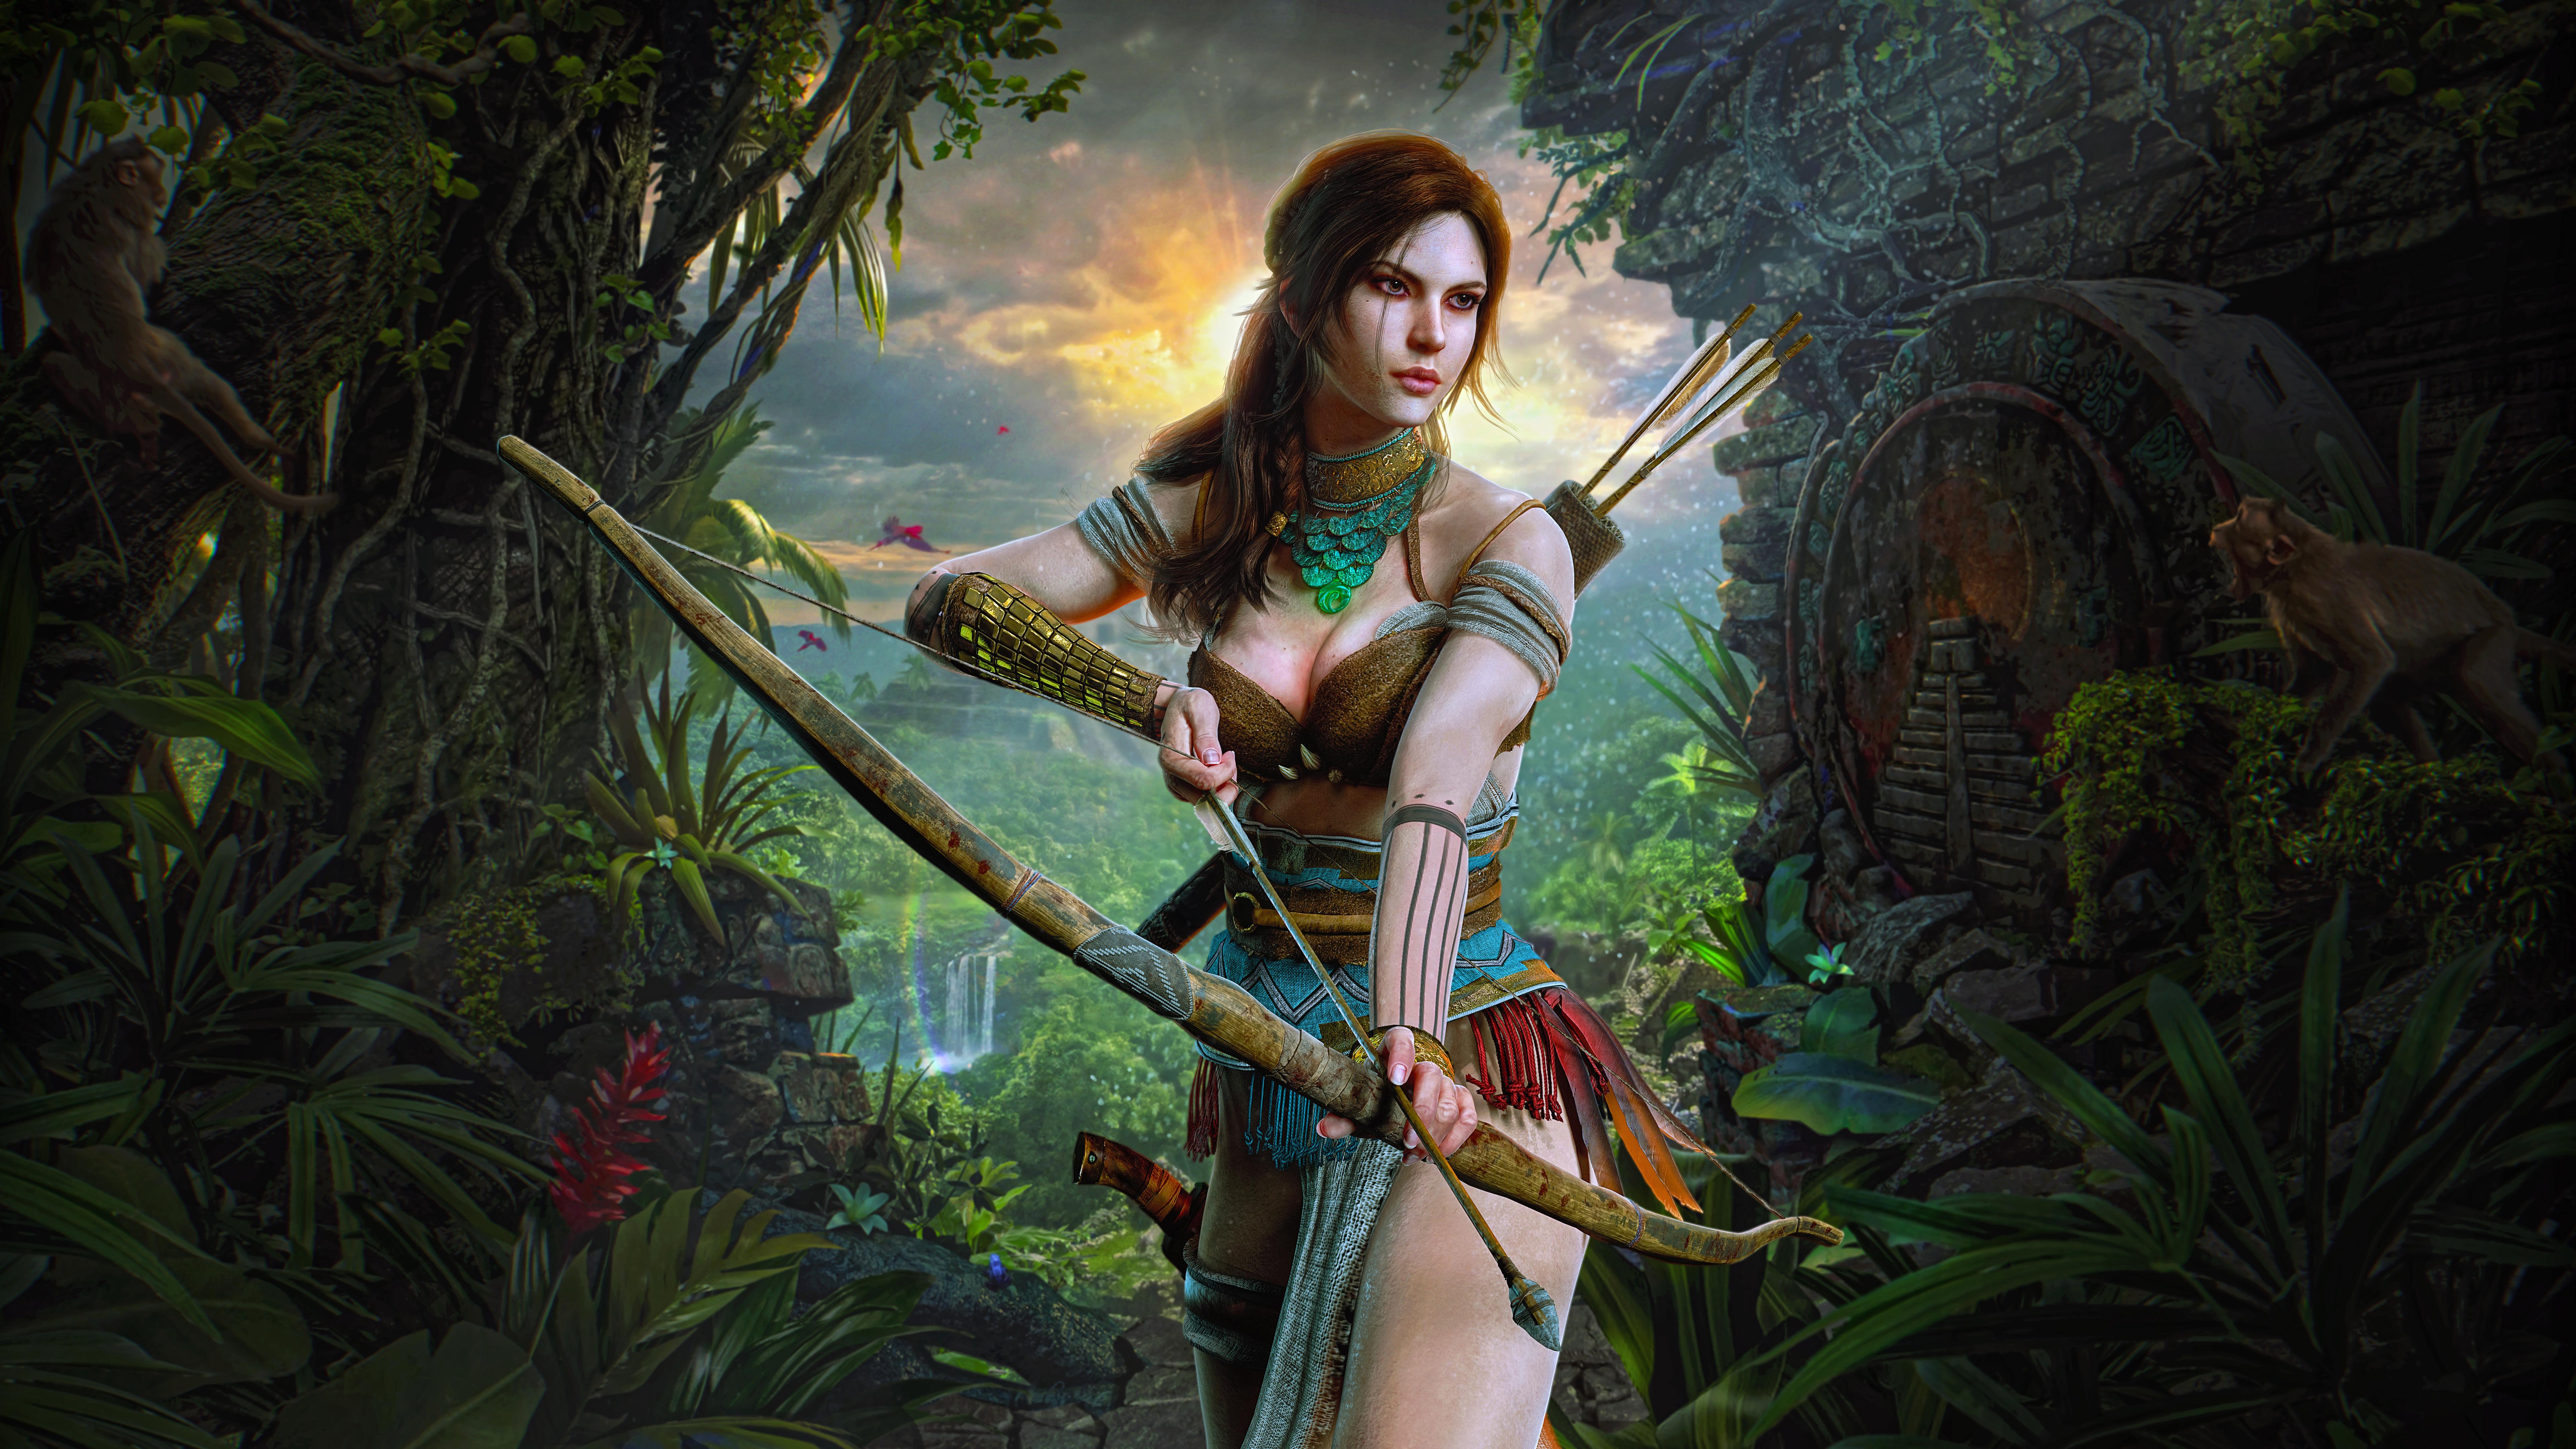 lara-croft-hunter-girl-8k-o0.jpg